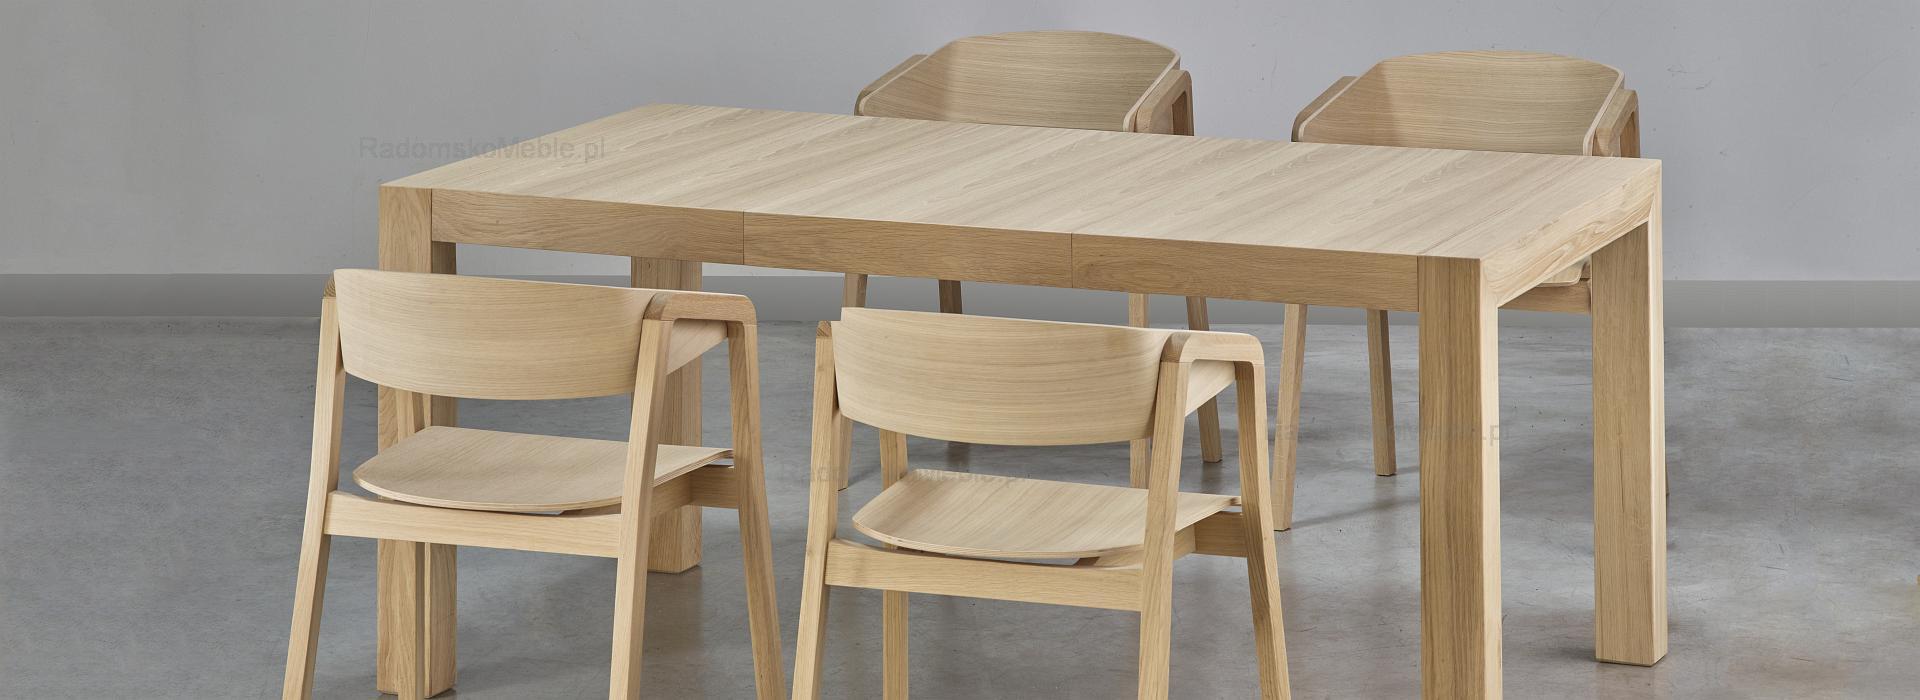 Stół ST SINPLE + Fotel CAVA BS  DĄB